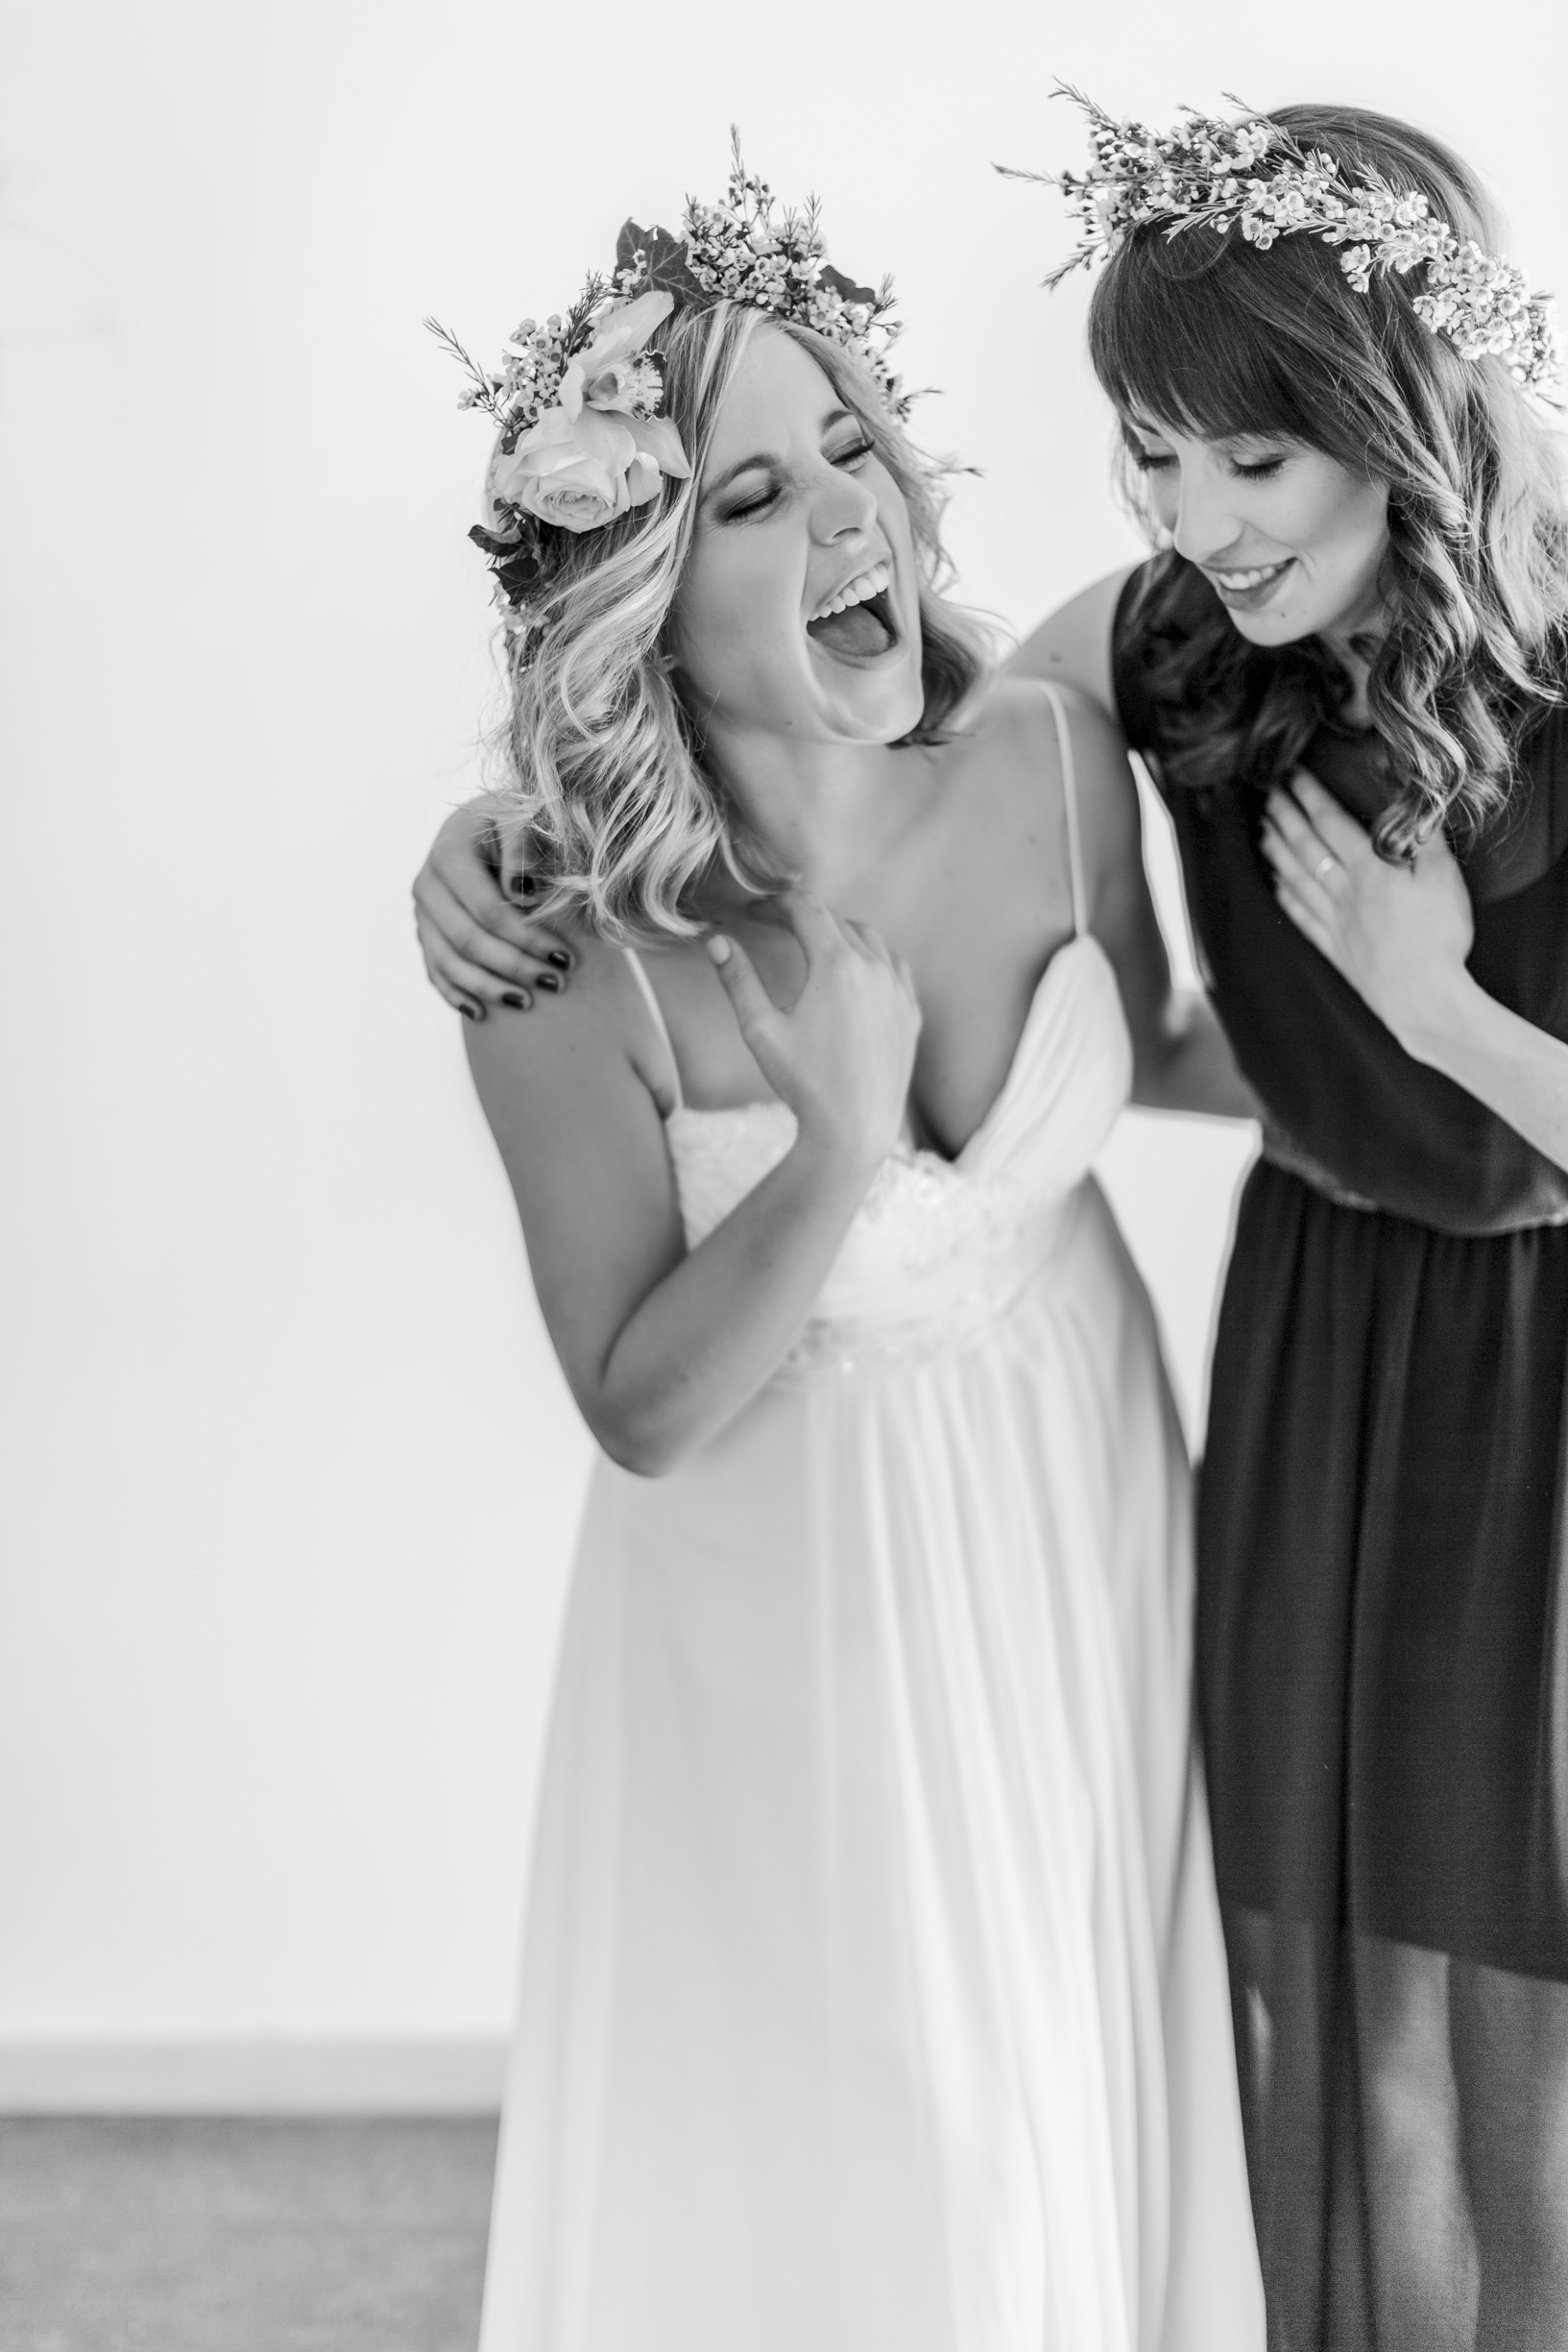 clareece smit wedding photographer based Gauteng South africa